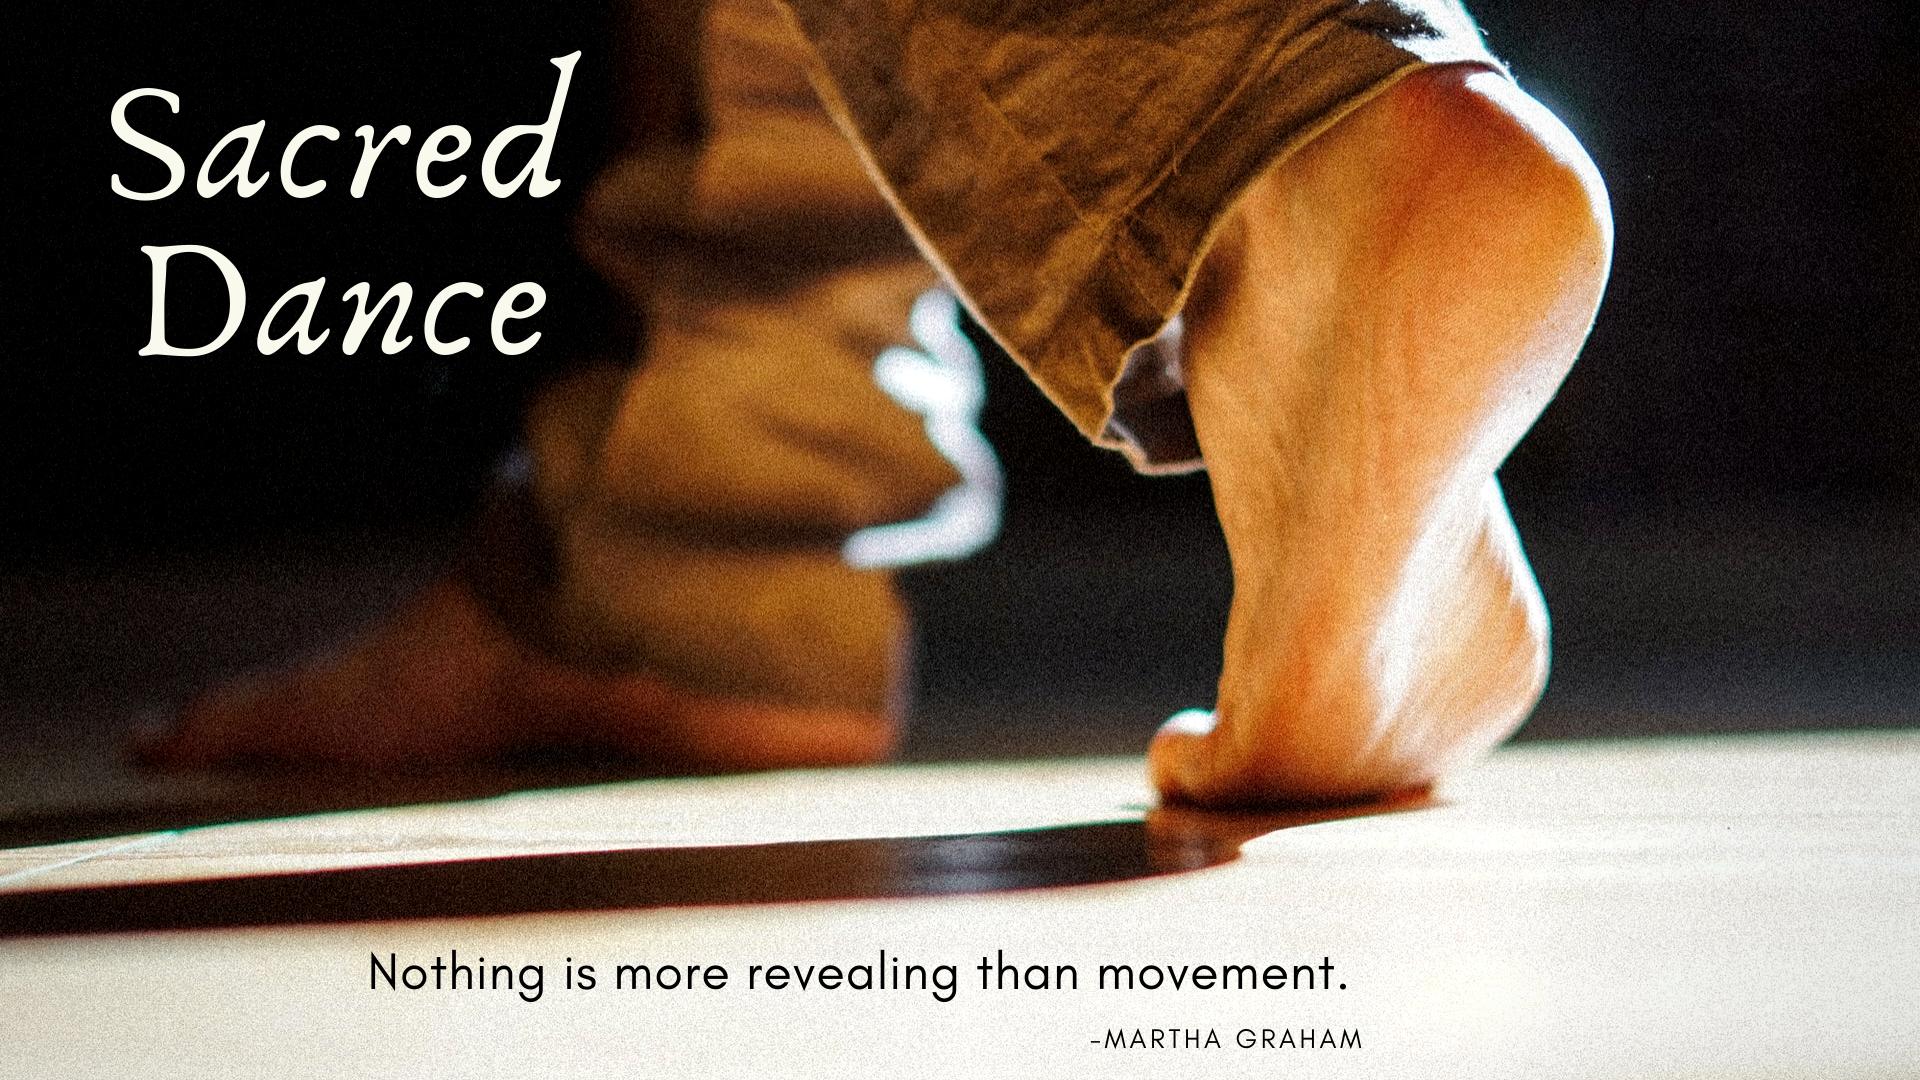 The Sacredness of Movement